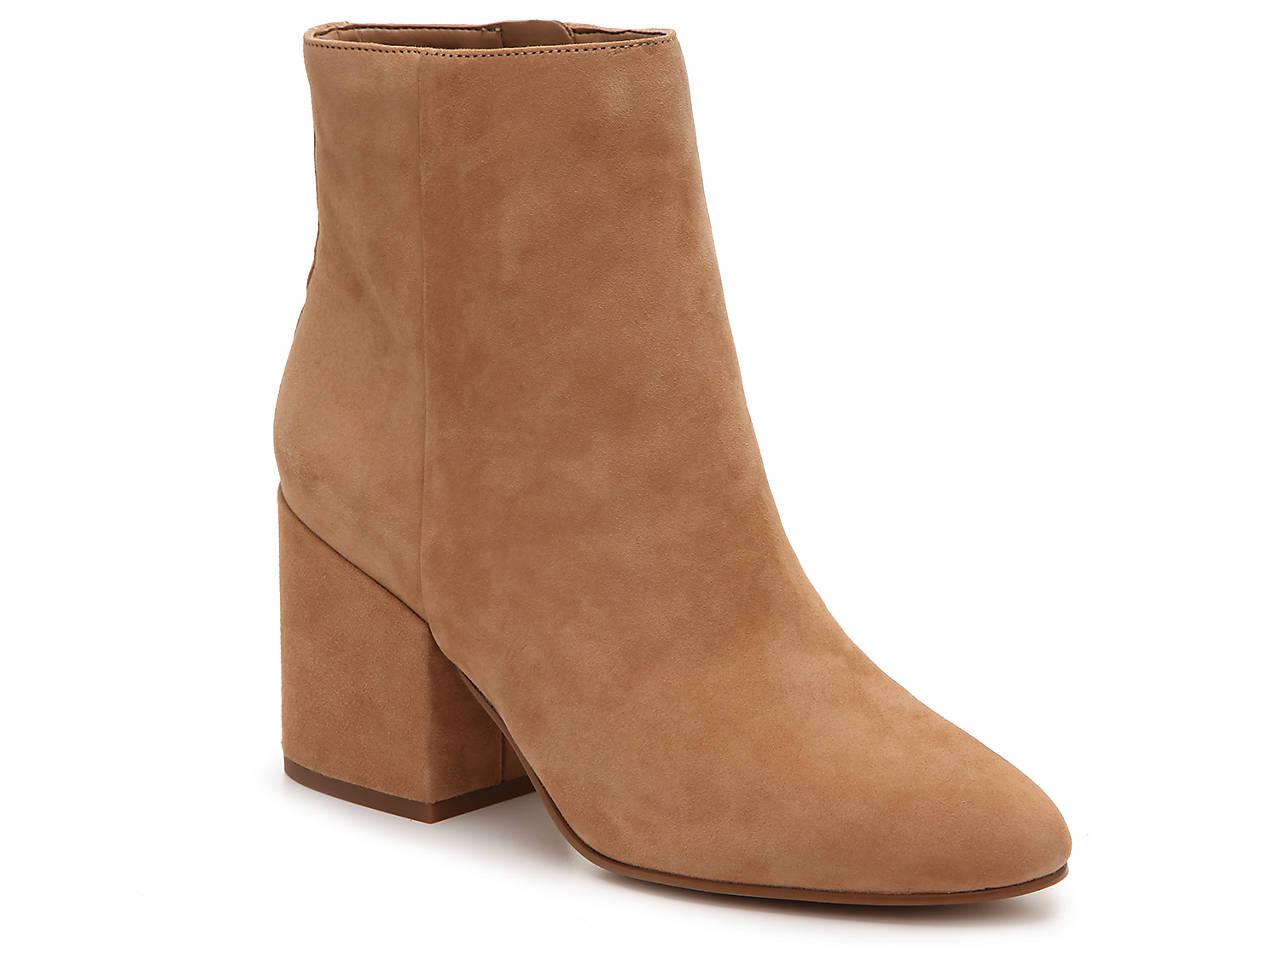 e70e8310f Sam Edelman Taye Bootie Women s Shoes